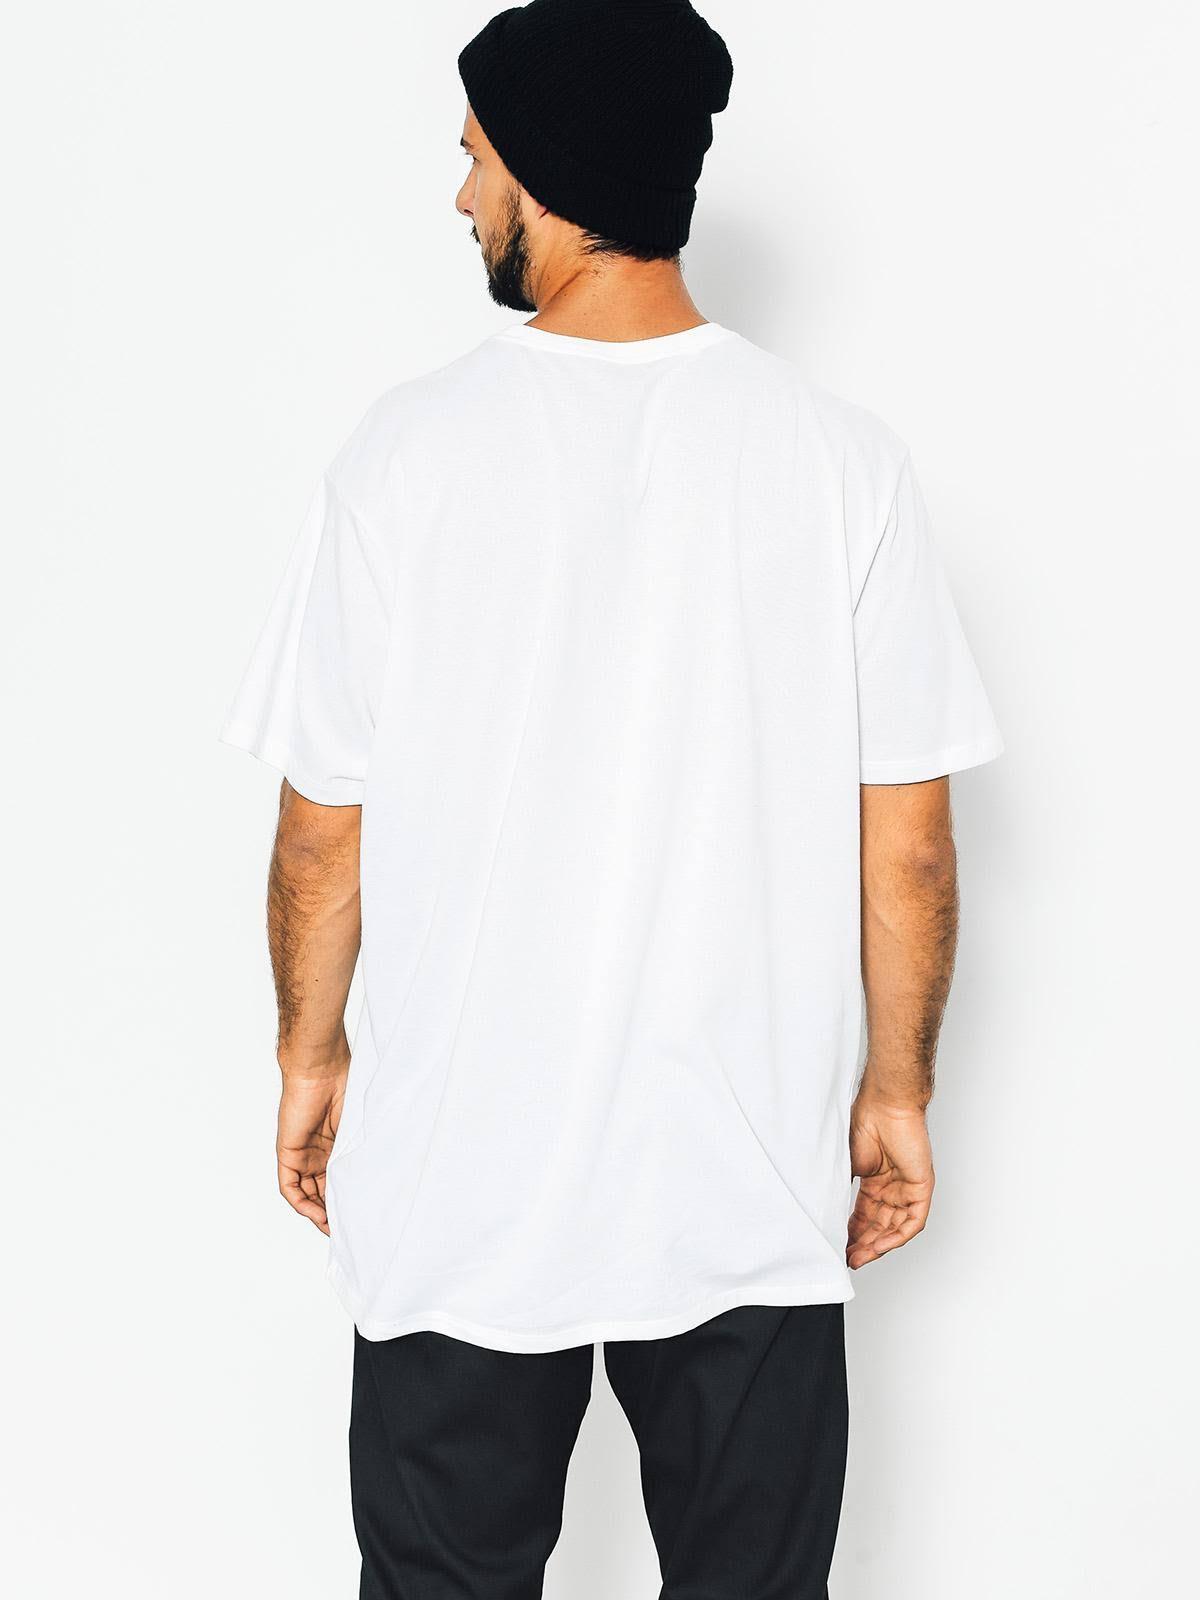 Nike SB Logo T Shirt White